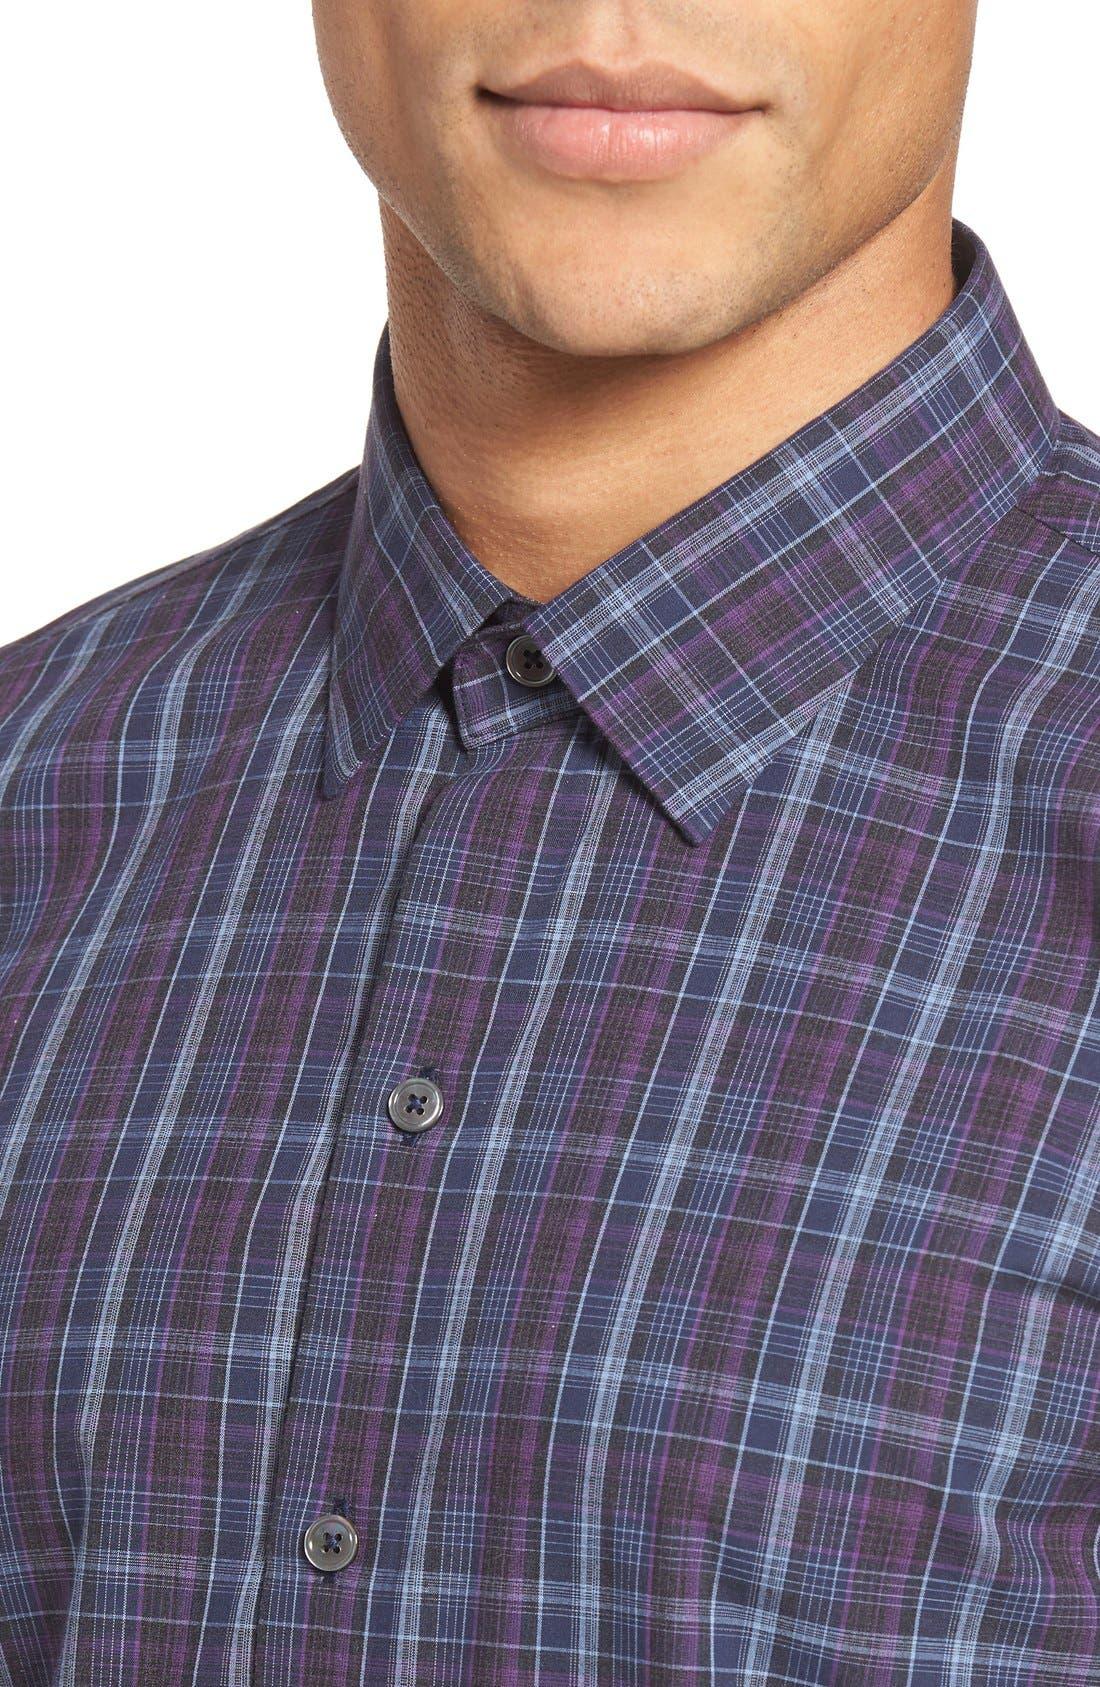 Bulatao Trim Fit Plaid Sport Shirt,                             Alternate thumbnail 4, color,                             Purple